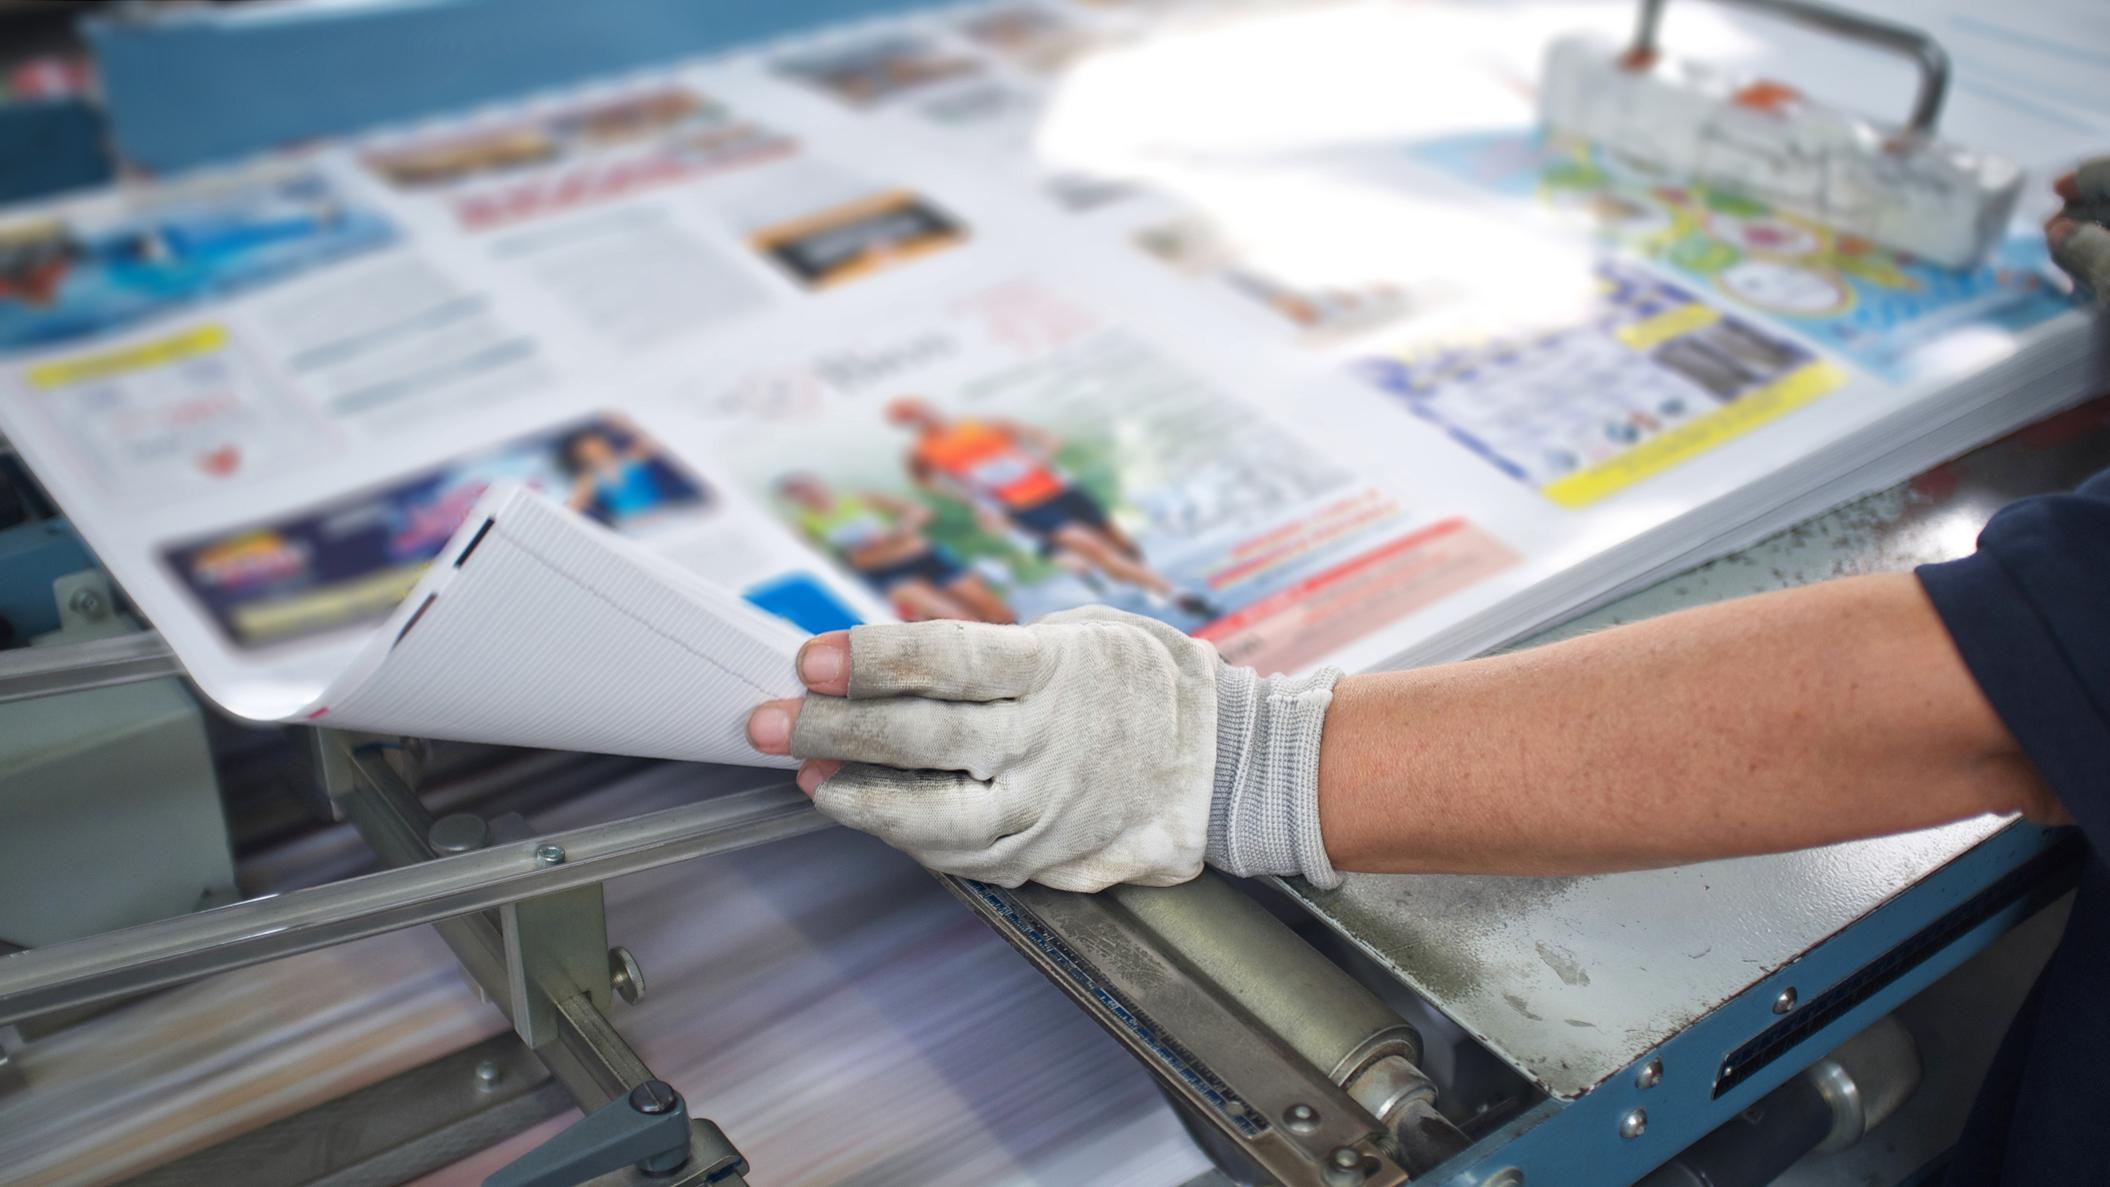 Printer looking at a magazine layout